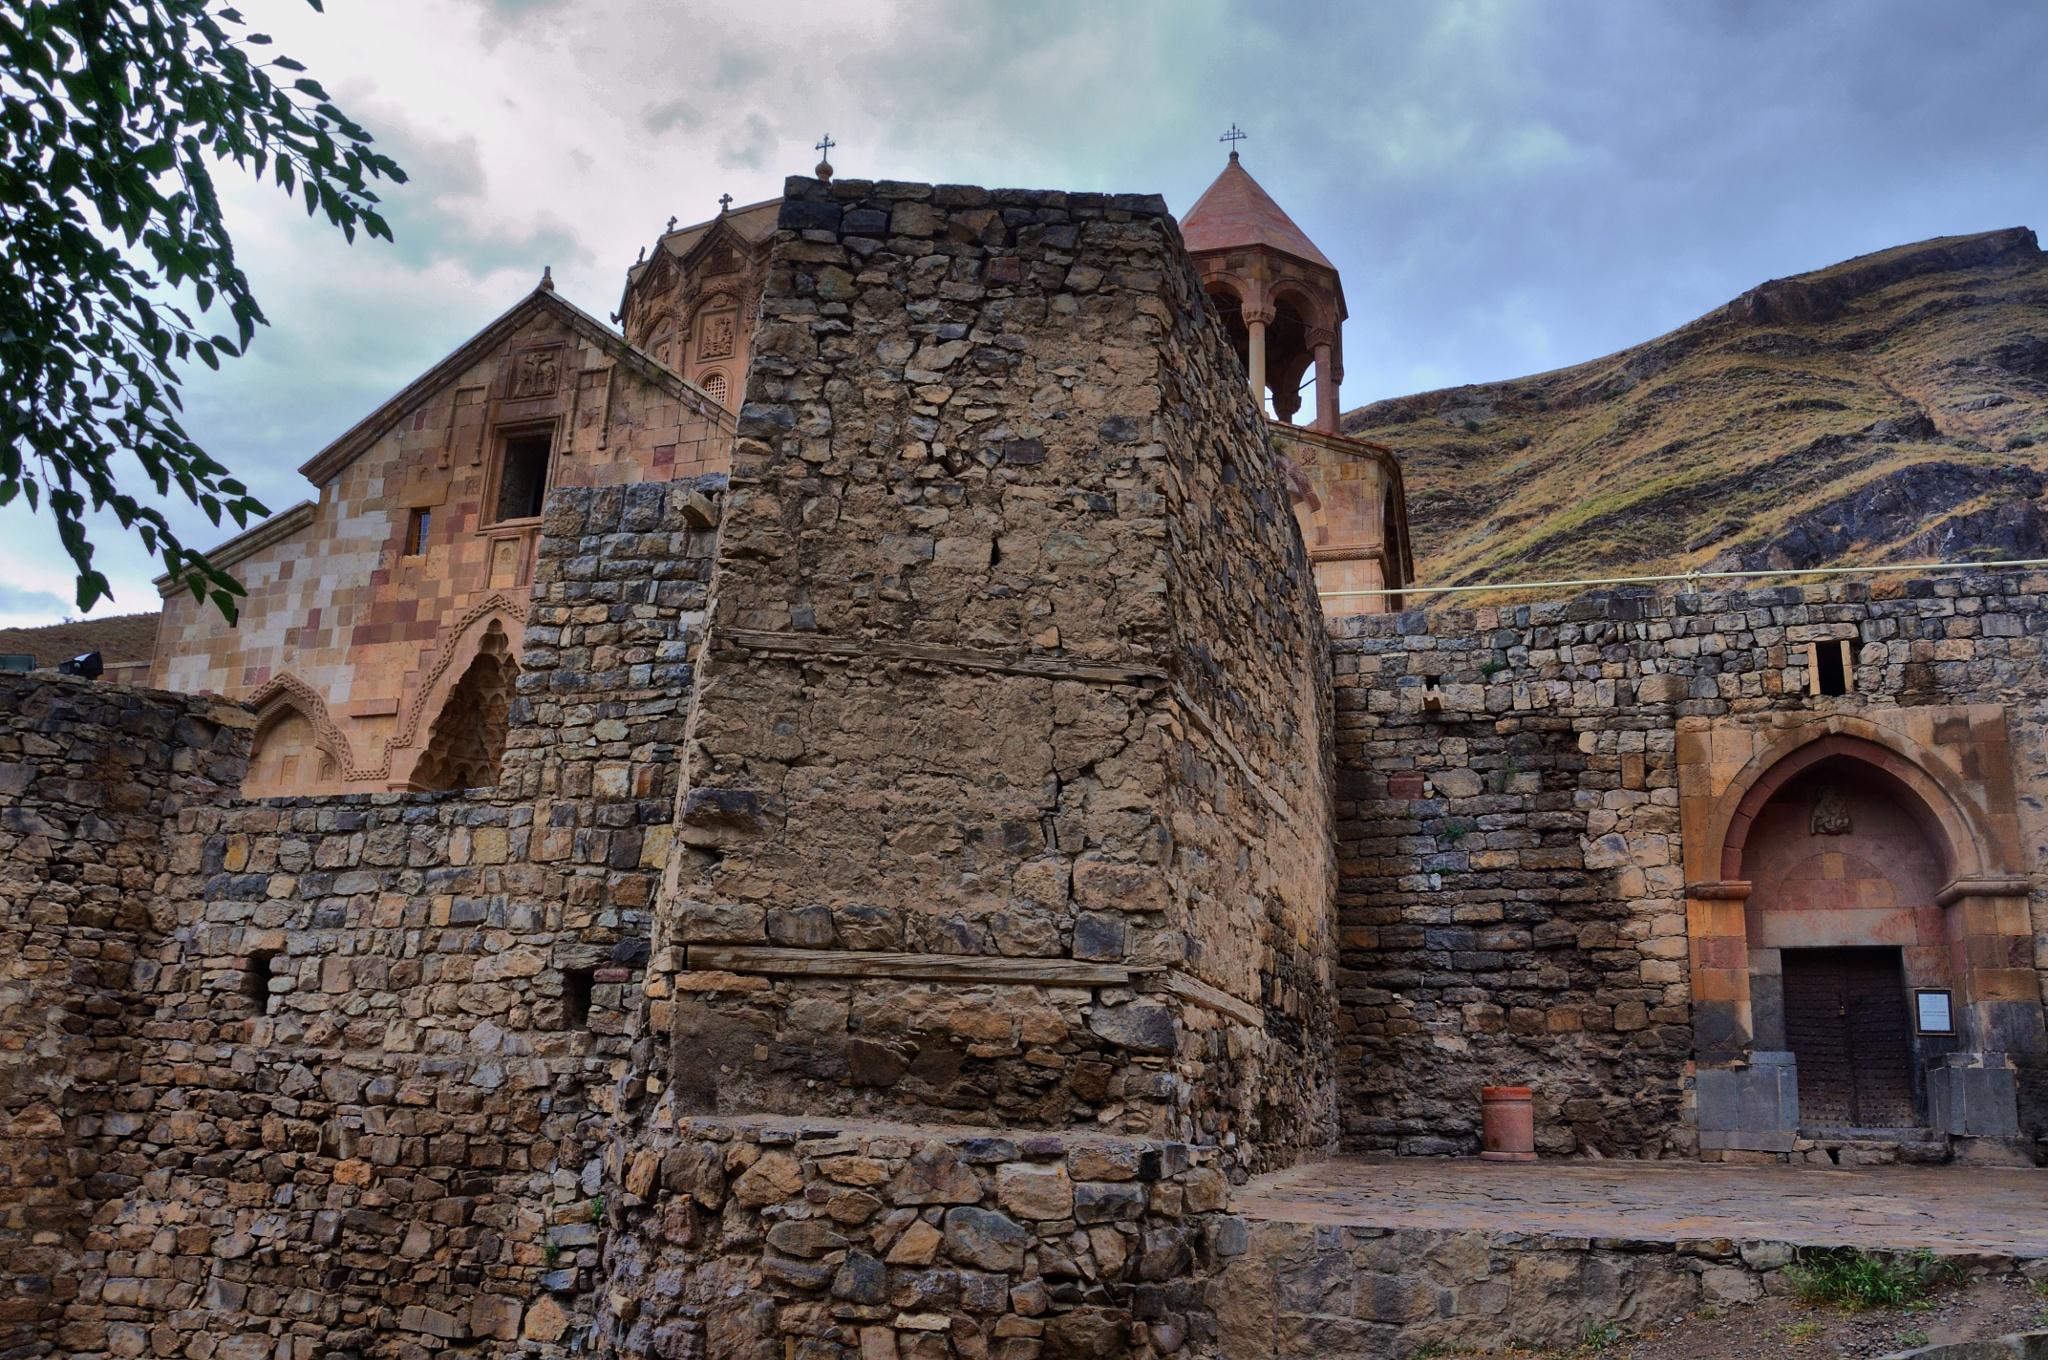 Saint Stepanos Monastery,15 km northwest of Jolfa city, East Azarbaijan Province northwest Iran by muhammadparvizi